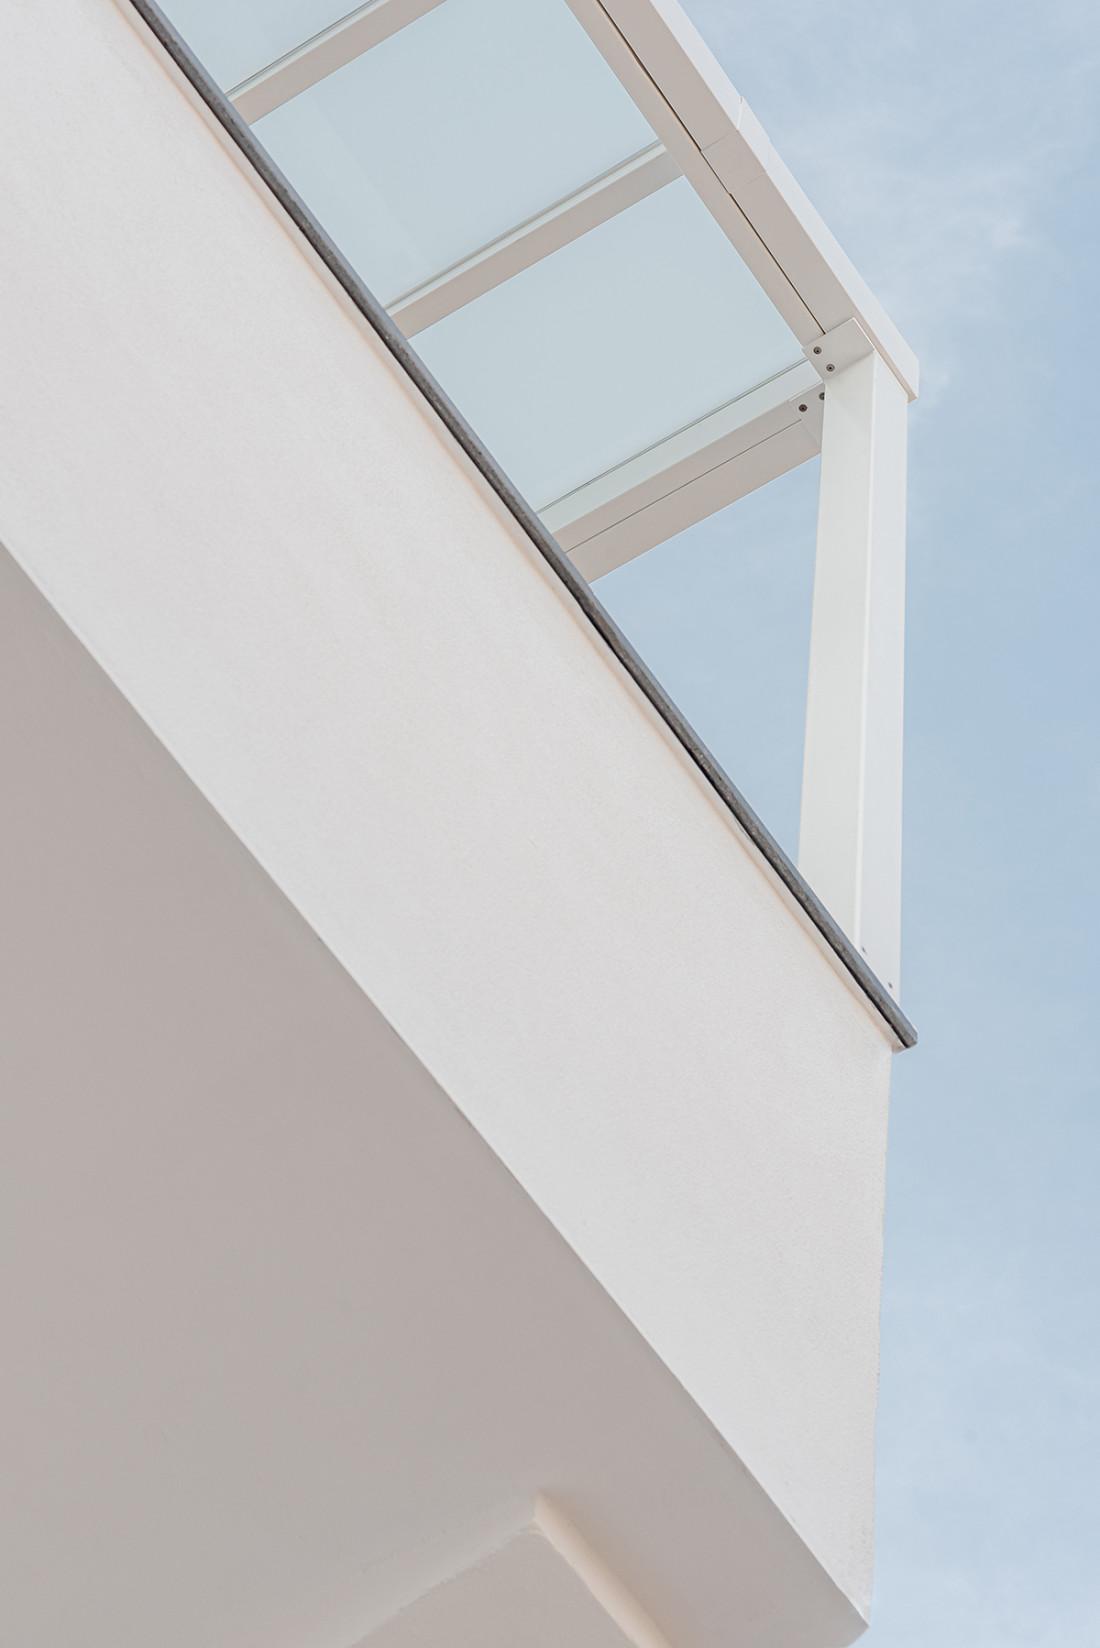 Manuarino Architettura design Napoli